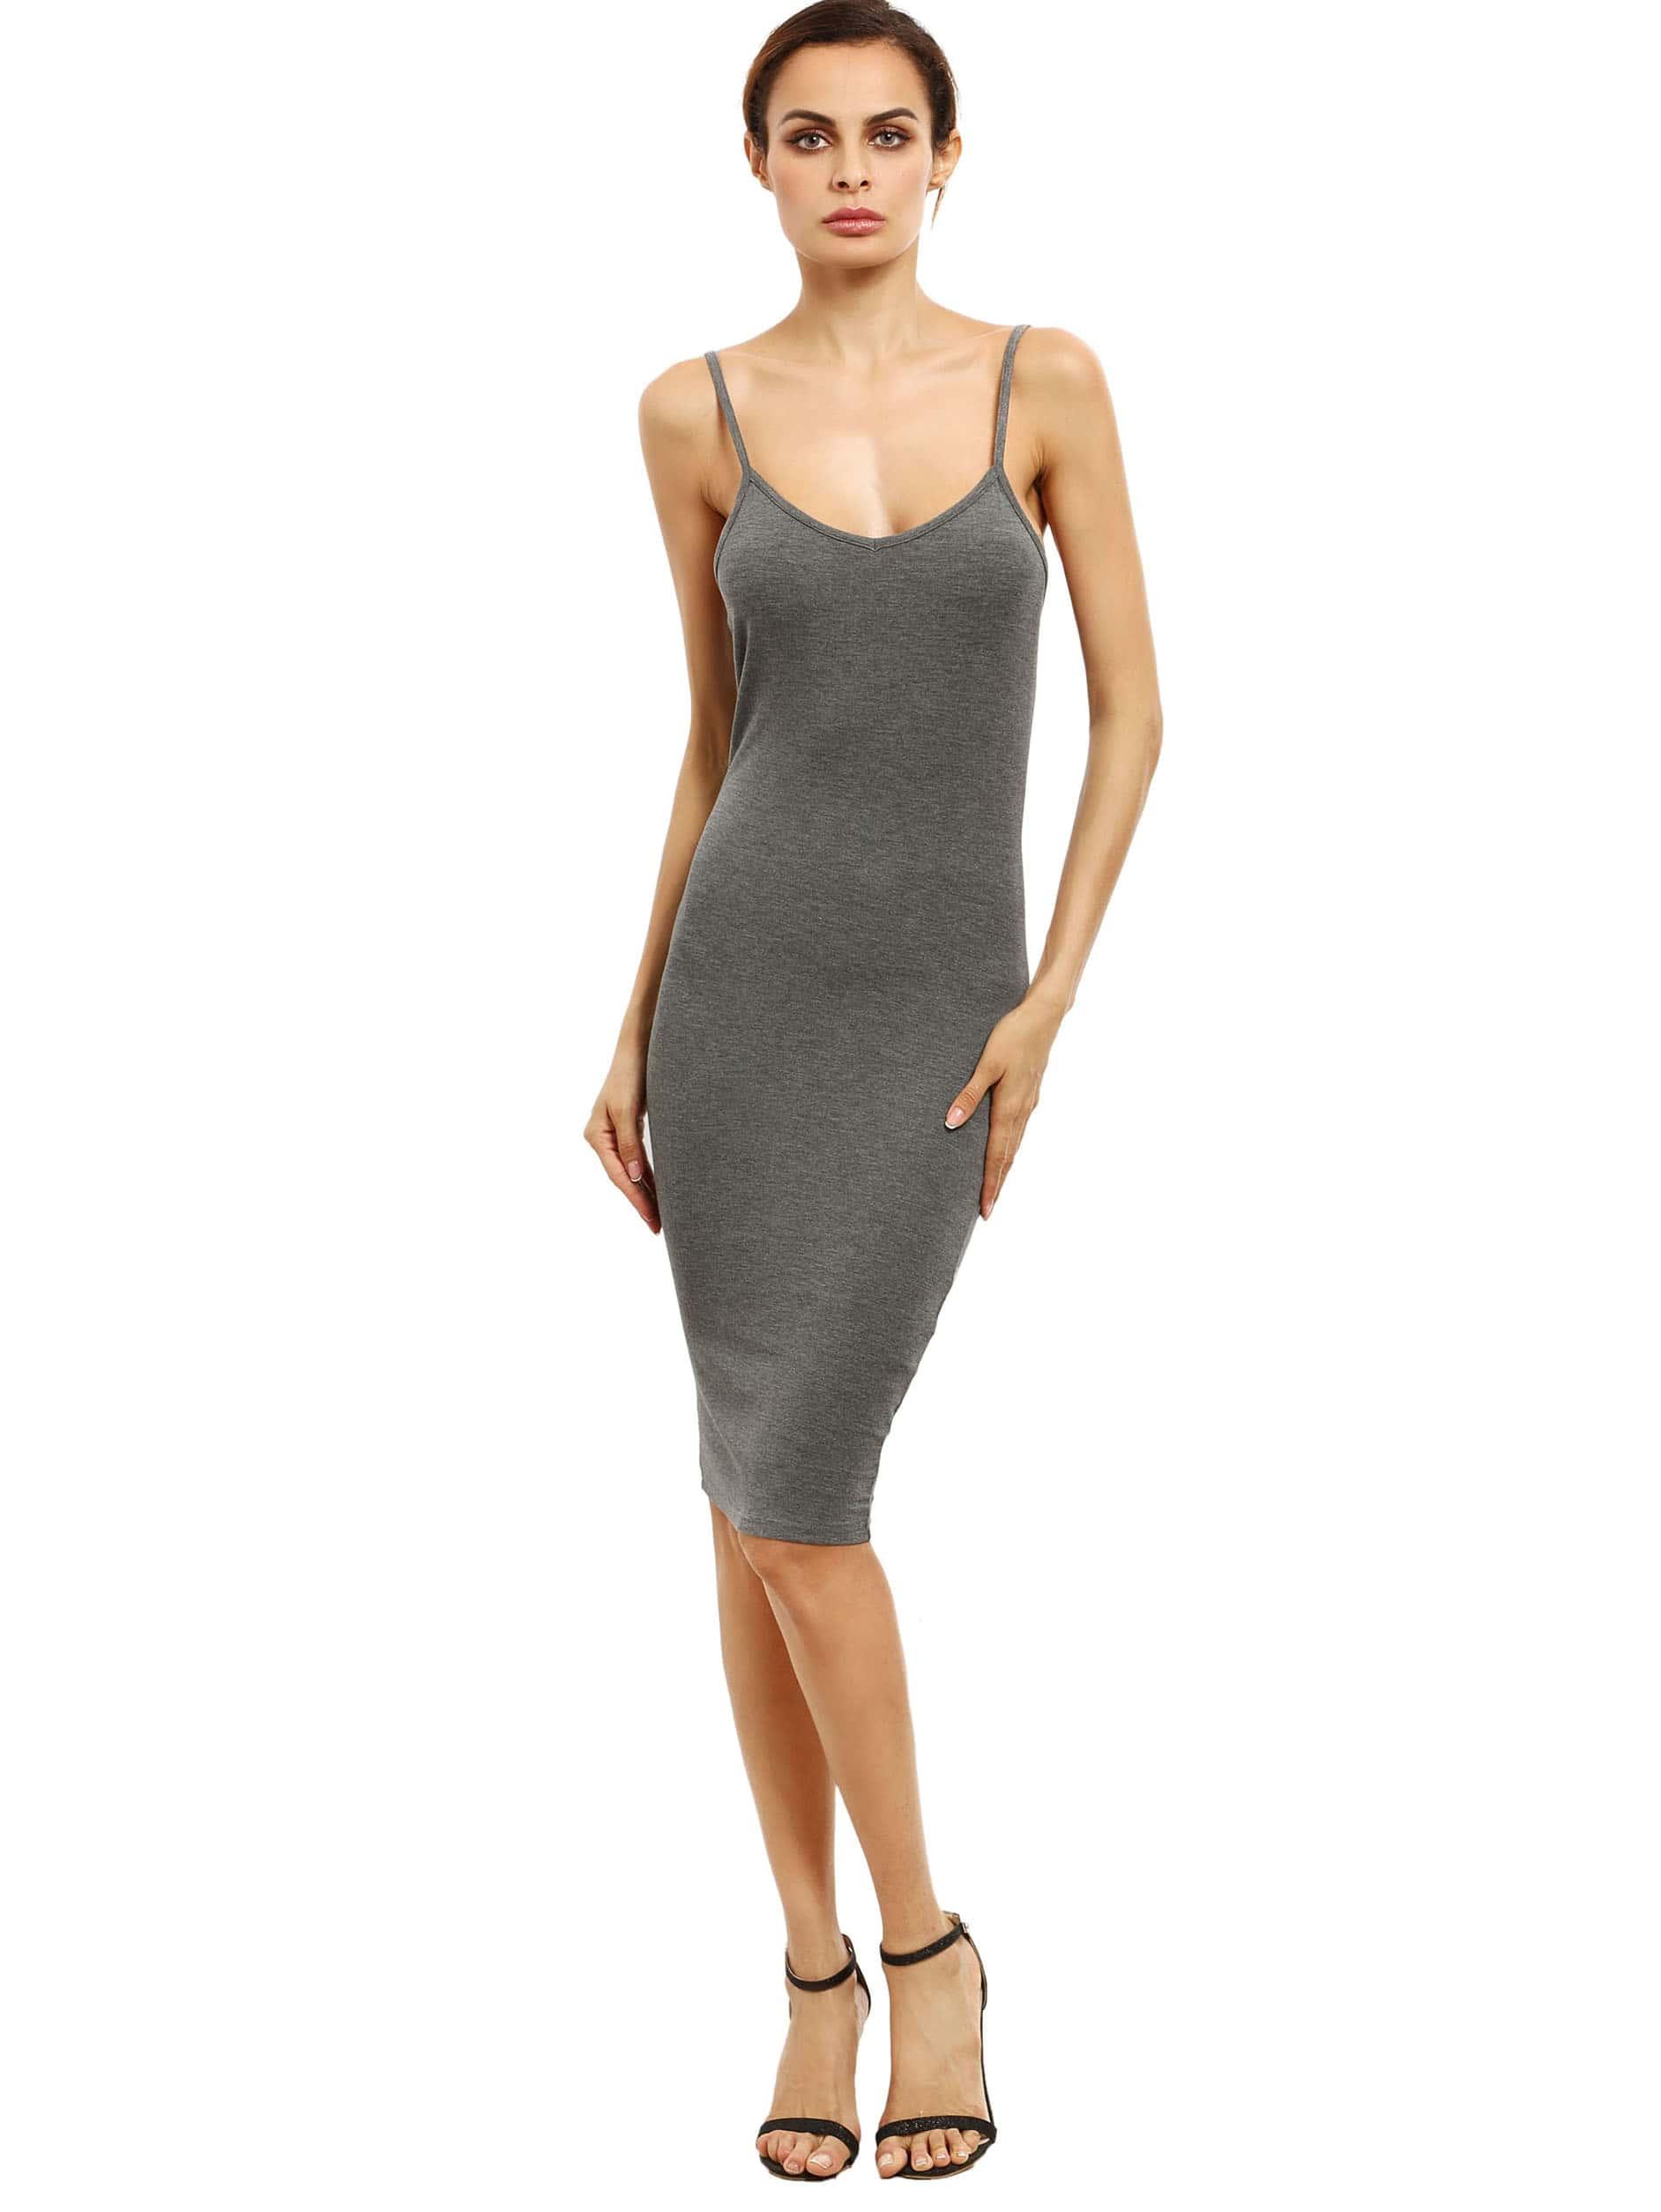 Grey Spaghetti Strap Sheath Dress dress160720761